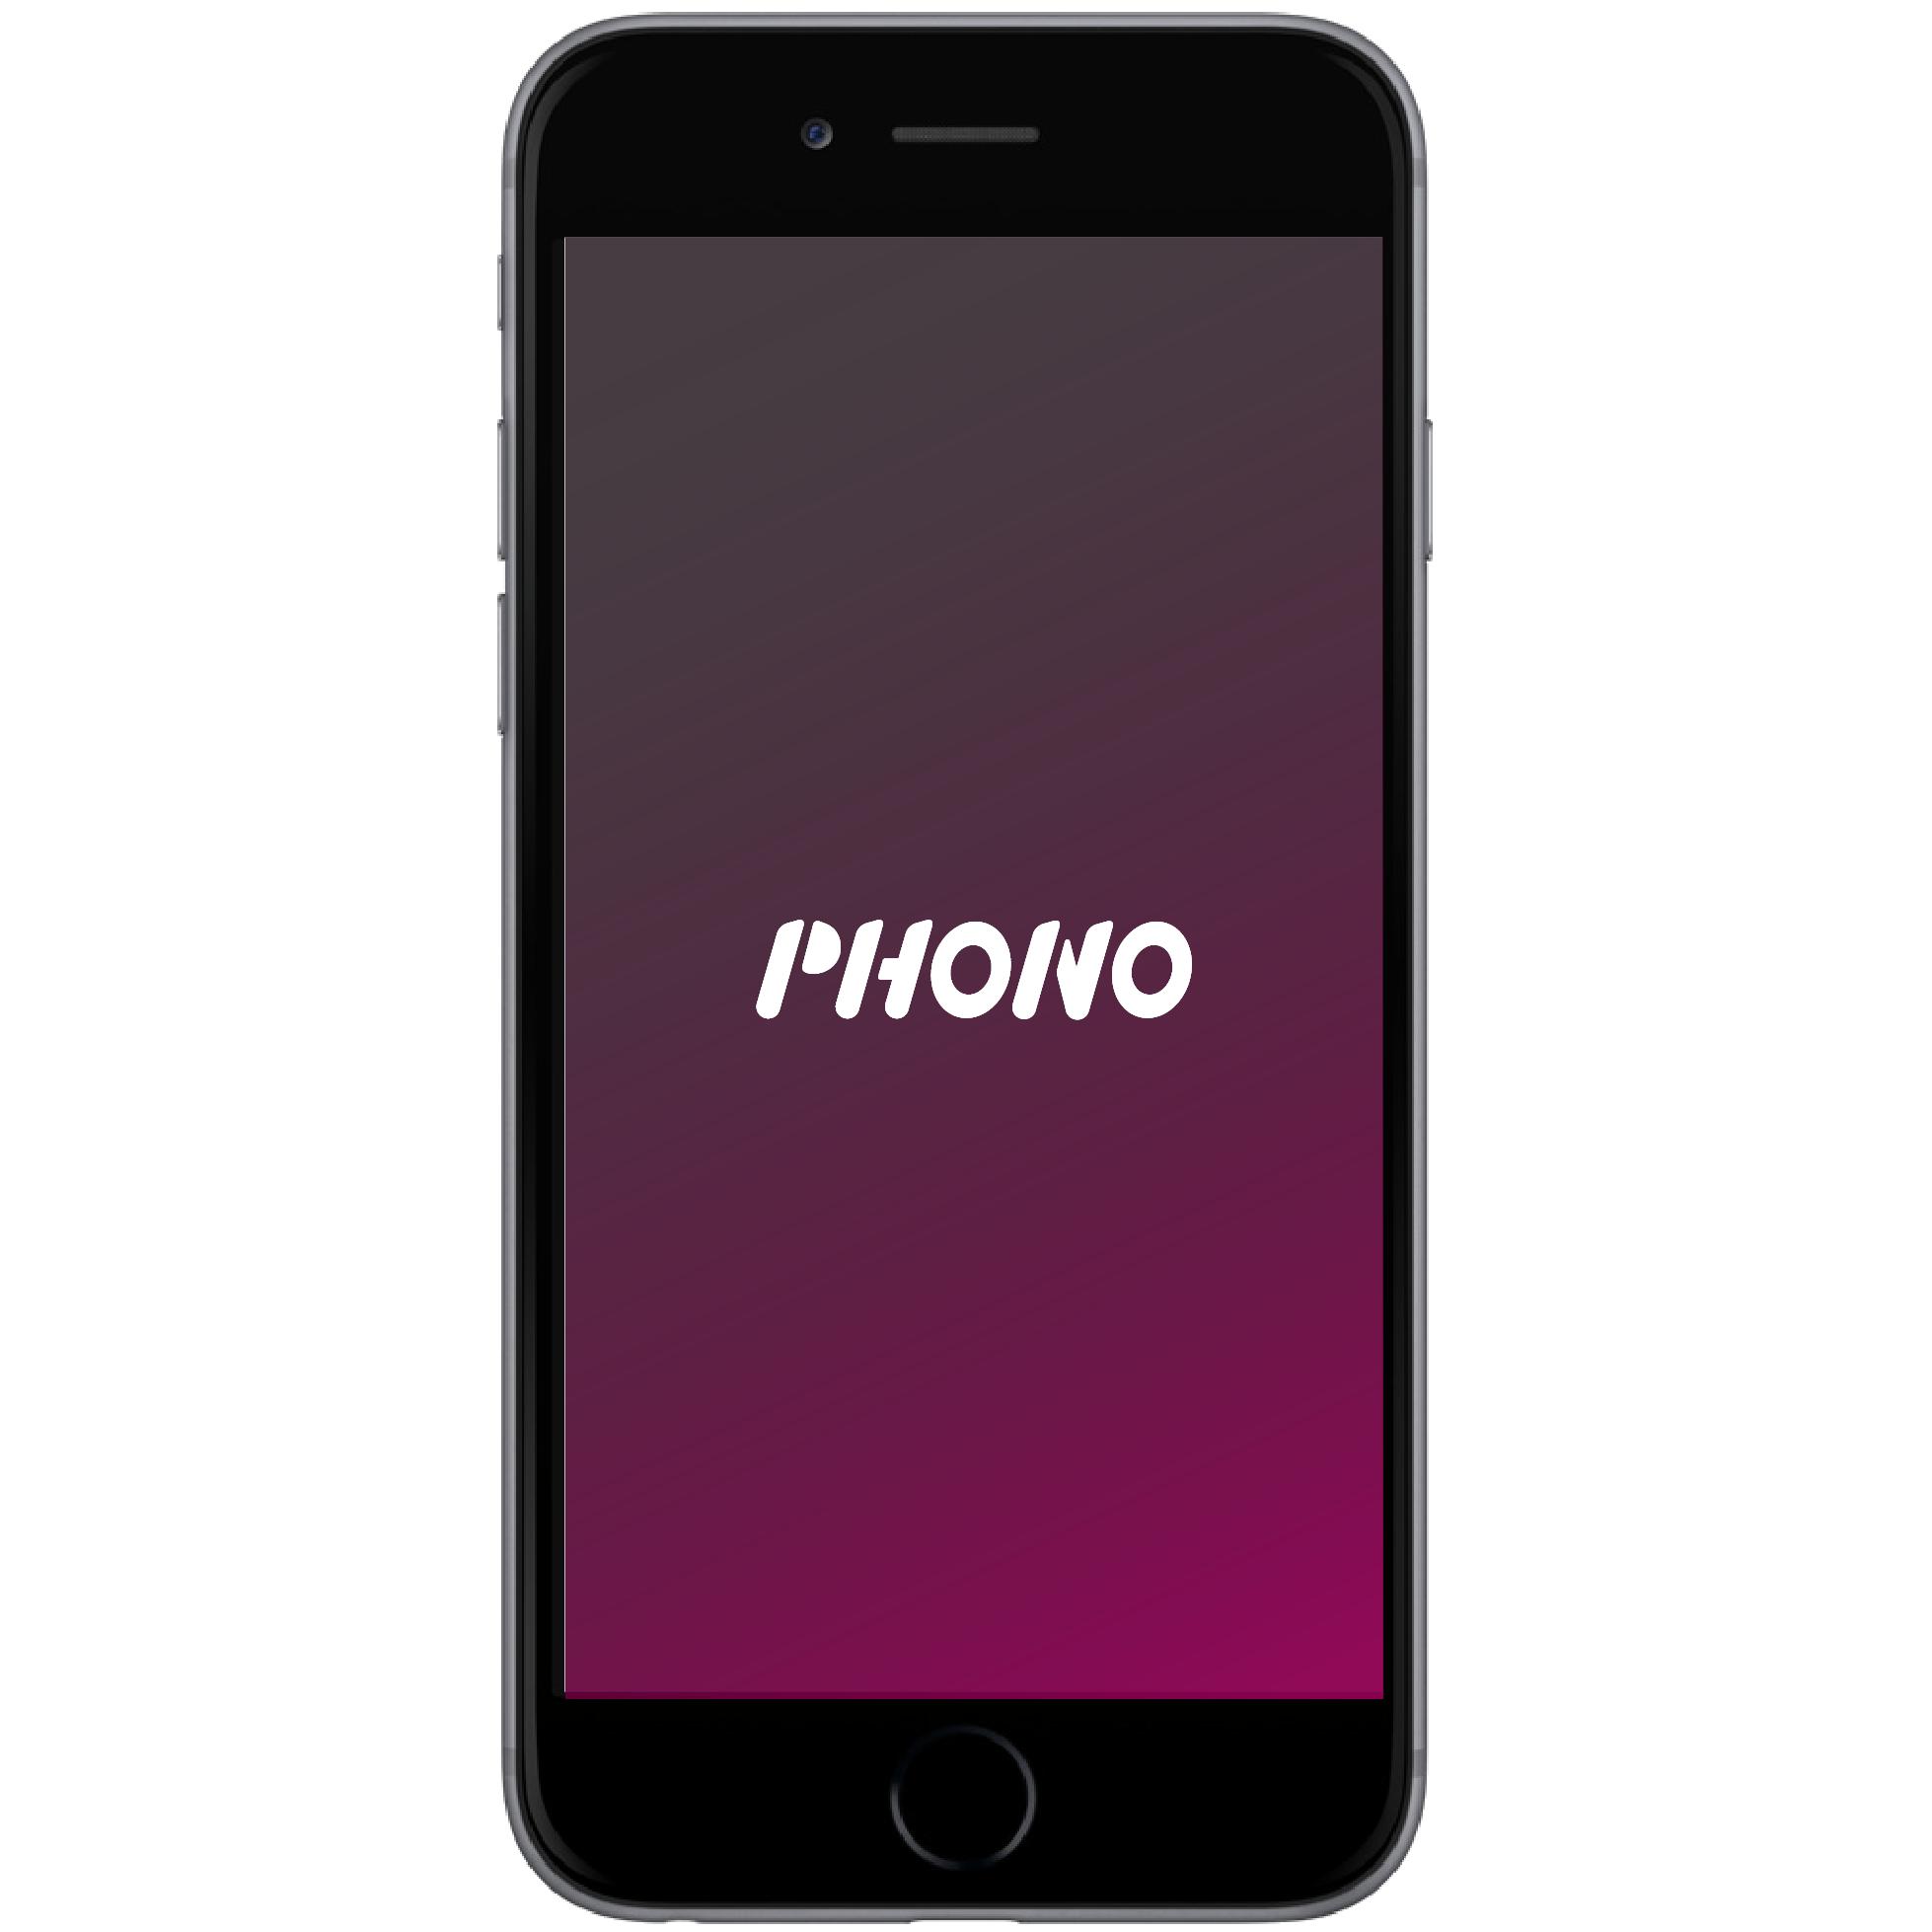 Phono Screen 1.png